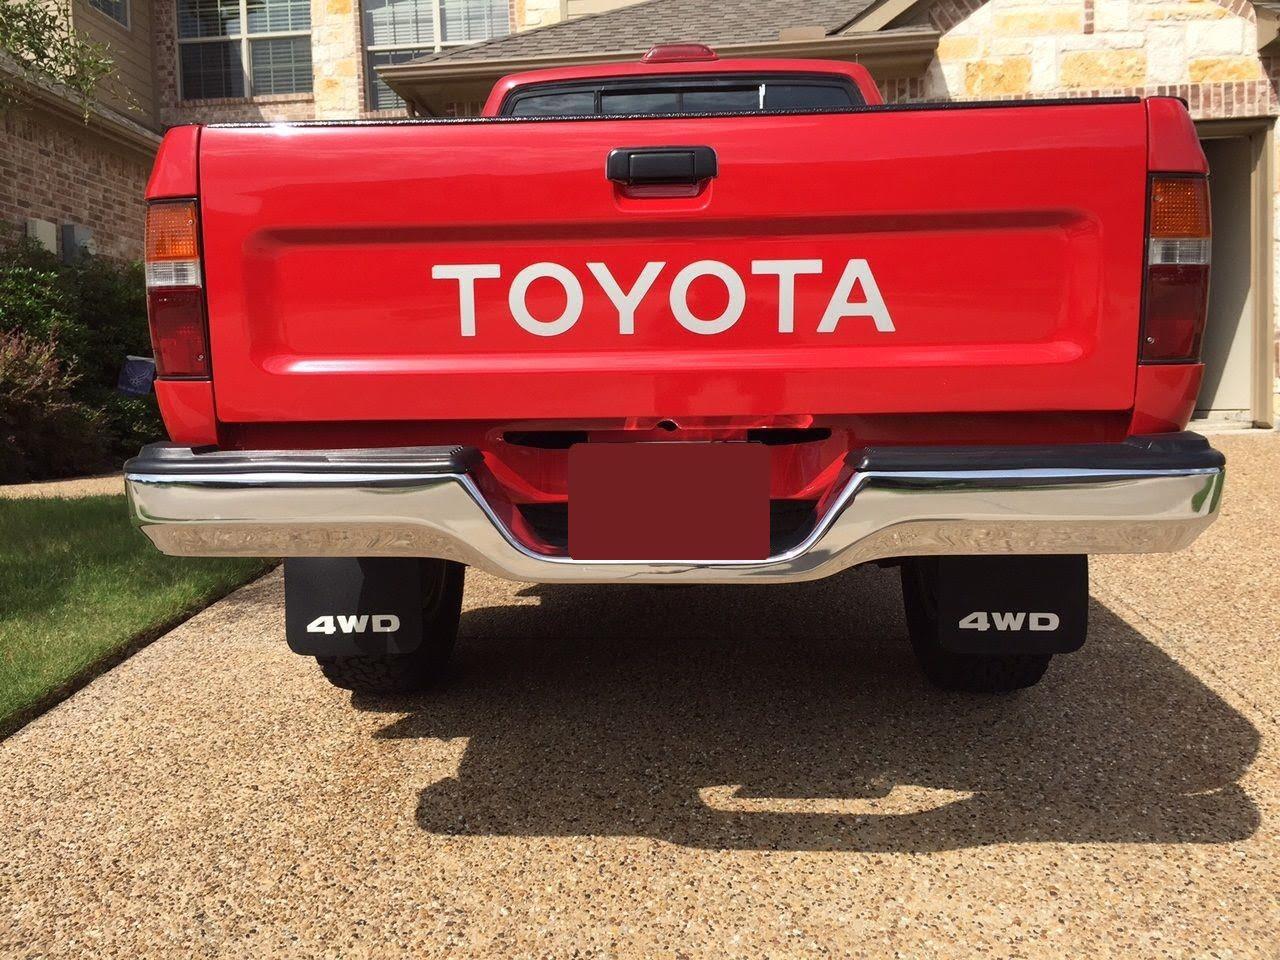 Craigslist Houston Texas Cars And Trucks For Sale By Owner >> Craigslist Dallas Tx Cars And Trucks For Sale By Owner 2020